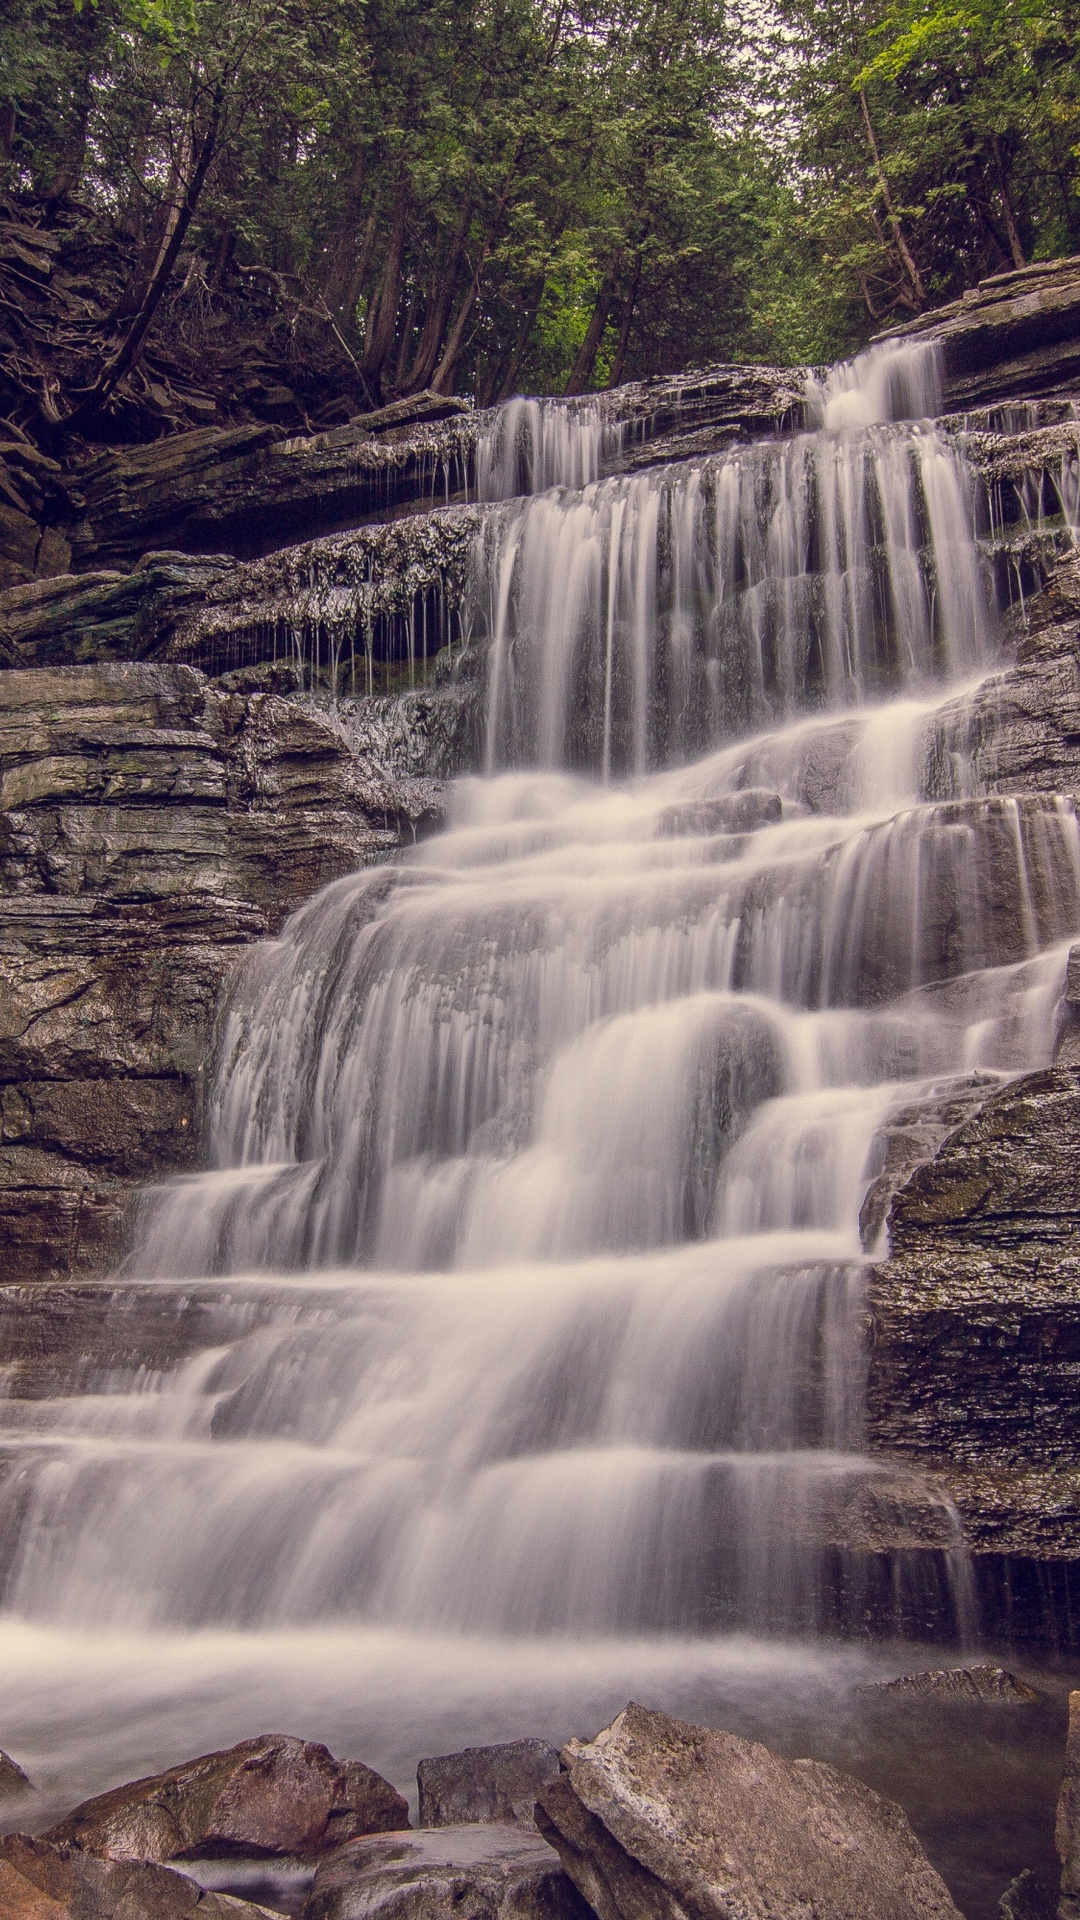 iPhone wallpaper waterfall2 Waterfall